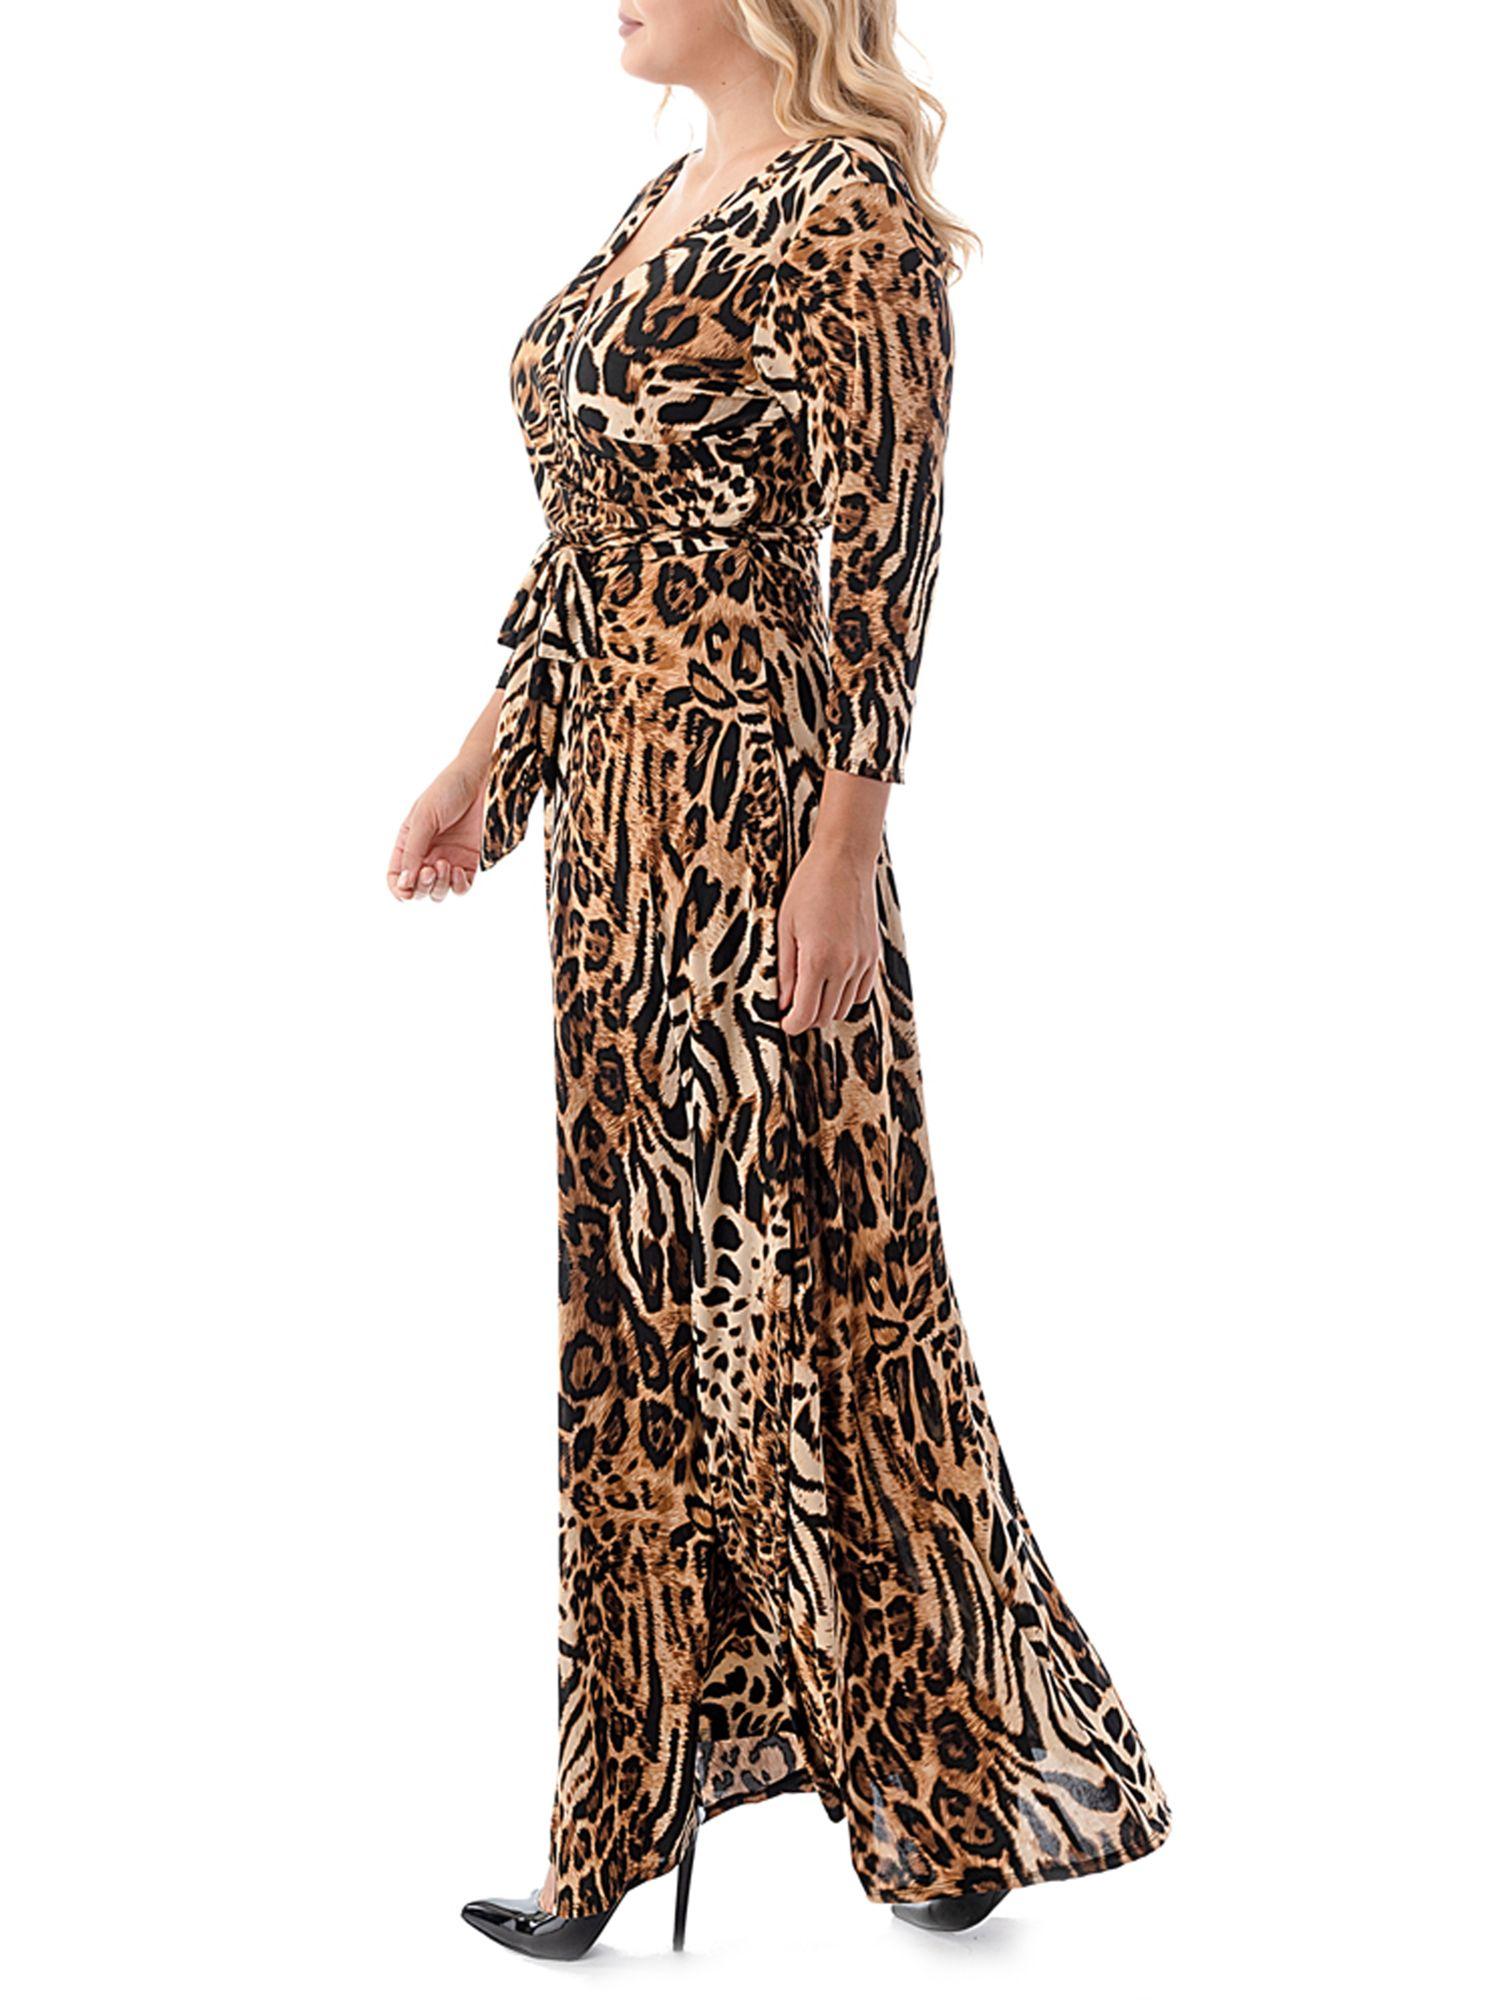 Ella Samani Ella Samani Women S Plus Size Faux Wrap Maxi Dress Walmart Com Maxi Dress Maxi Wrap Dress Dresses [ 2000 x 1500 Pixel ]